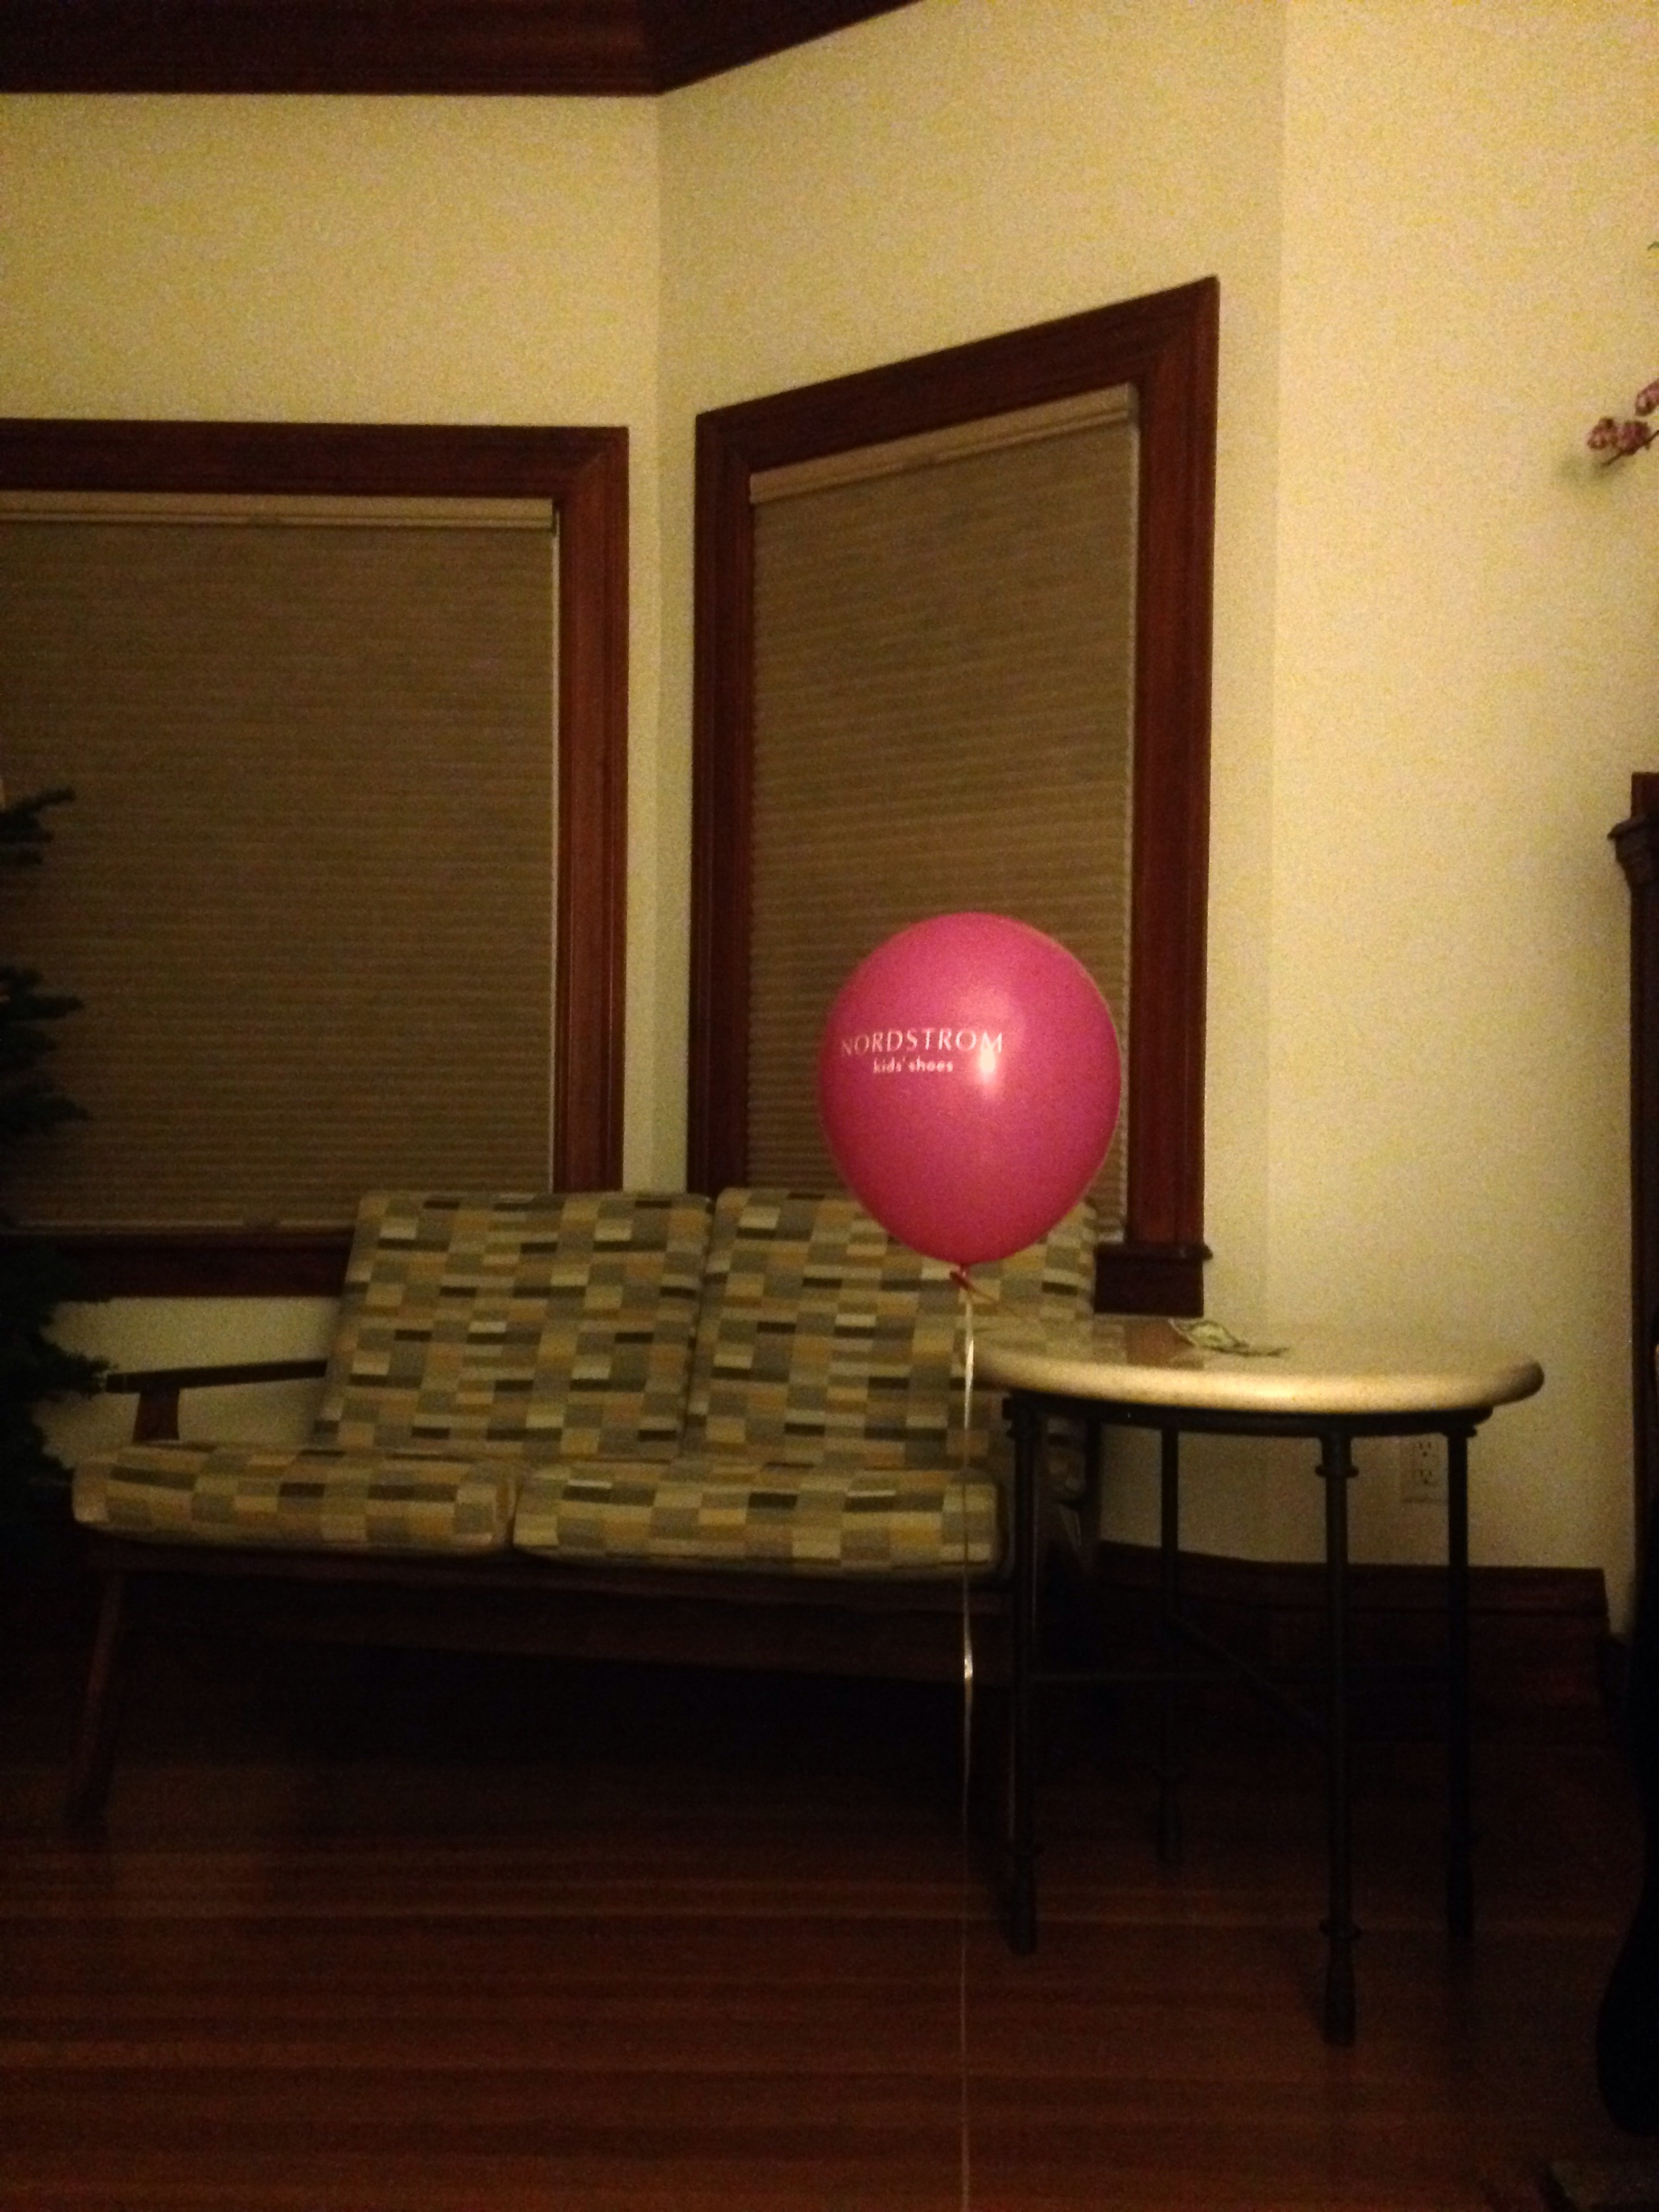 Complimentary balloon in living room, San Francisco, December 29, 2016.